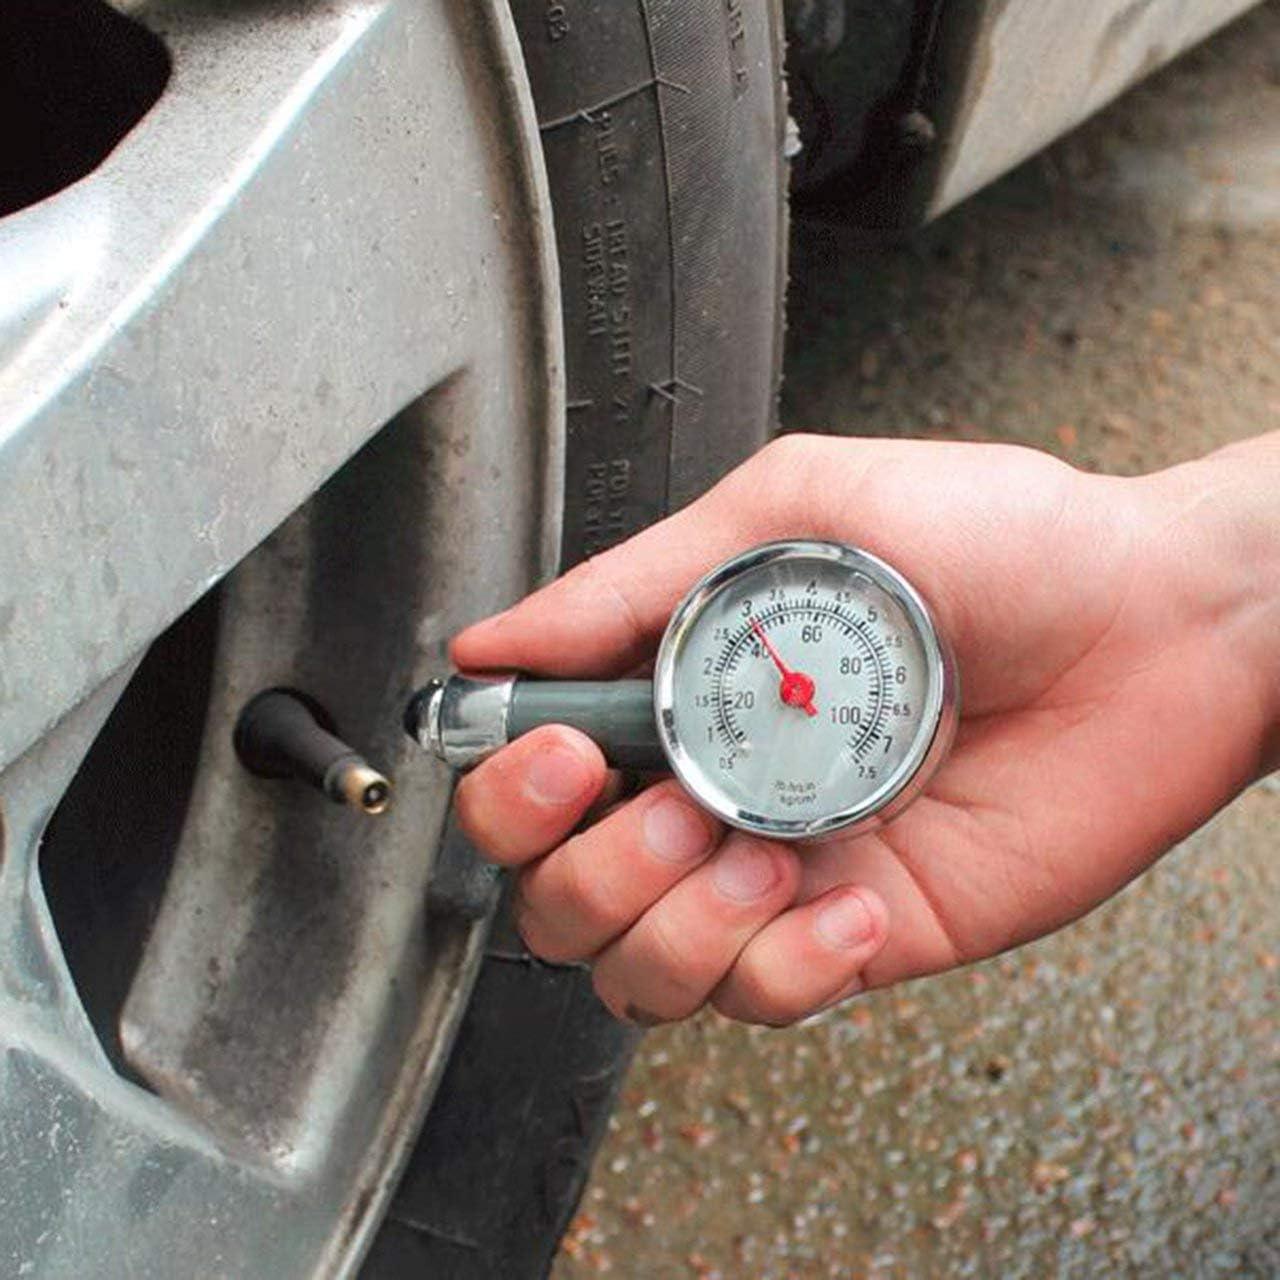 EmNarsissus High-precision Digital Tire Pressure Gauge Measurer Tool Display Tire Monitoring System Diagnostic Tool